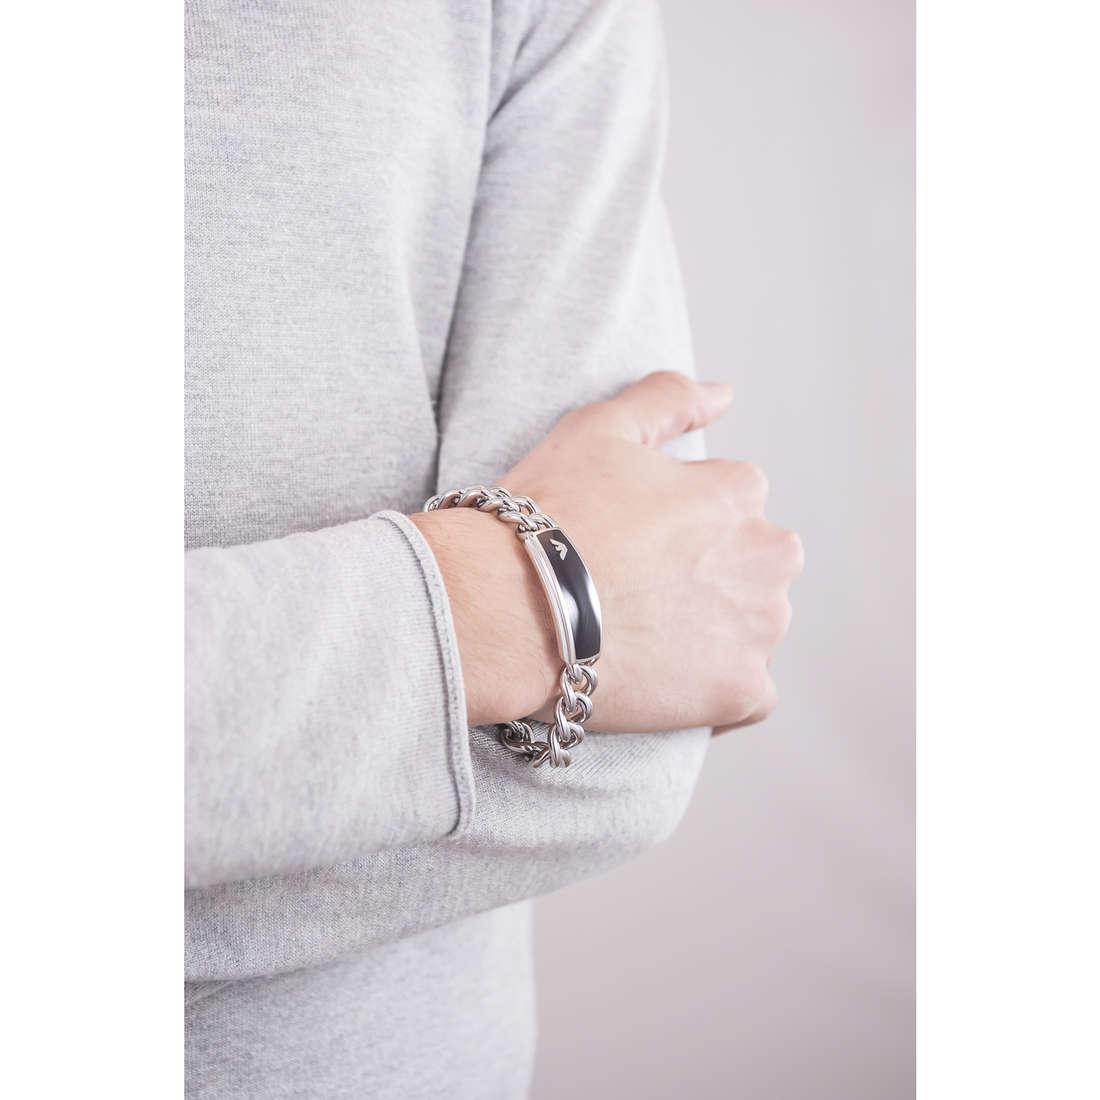 Emporio Armani bracciali uomo EGS172904019 indosso